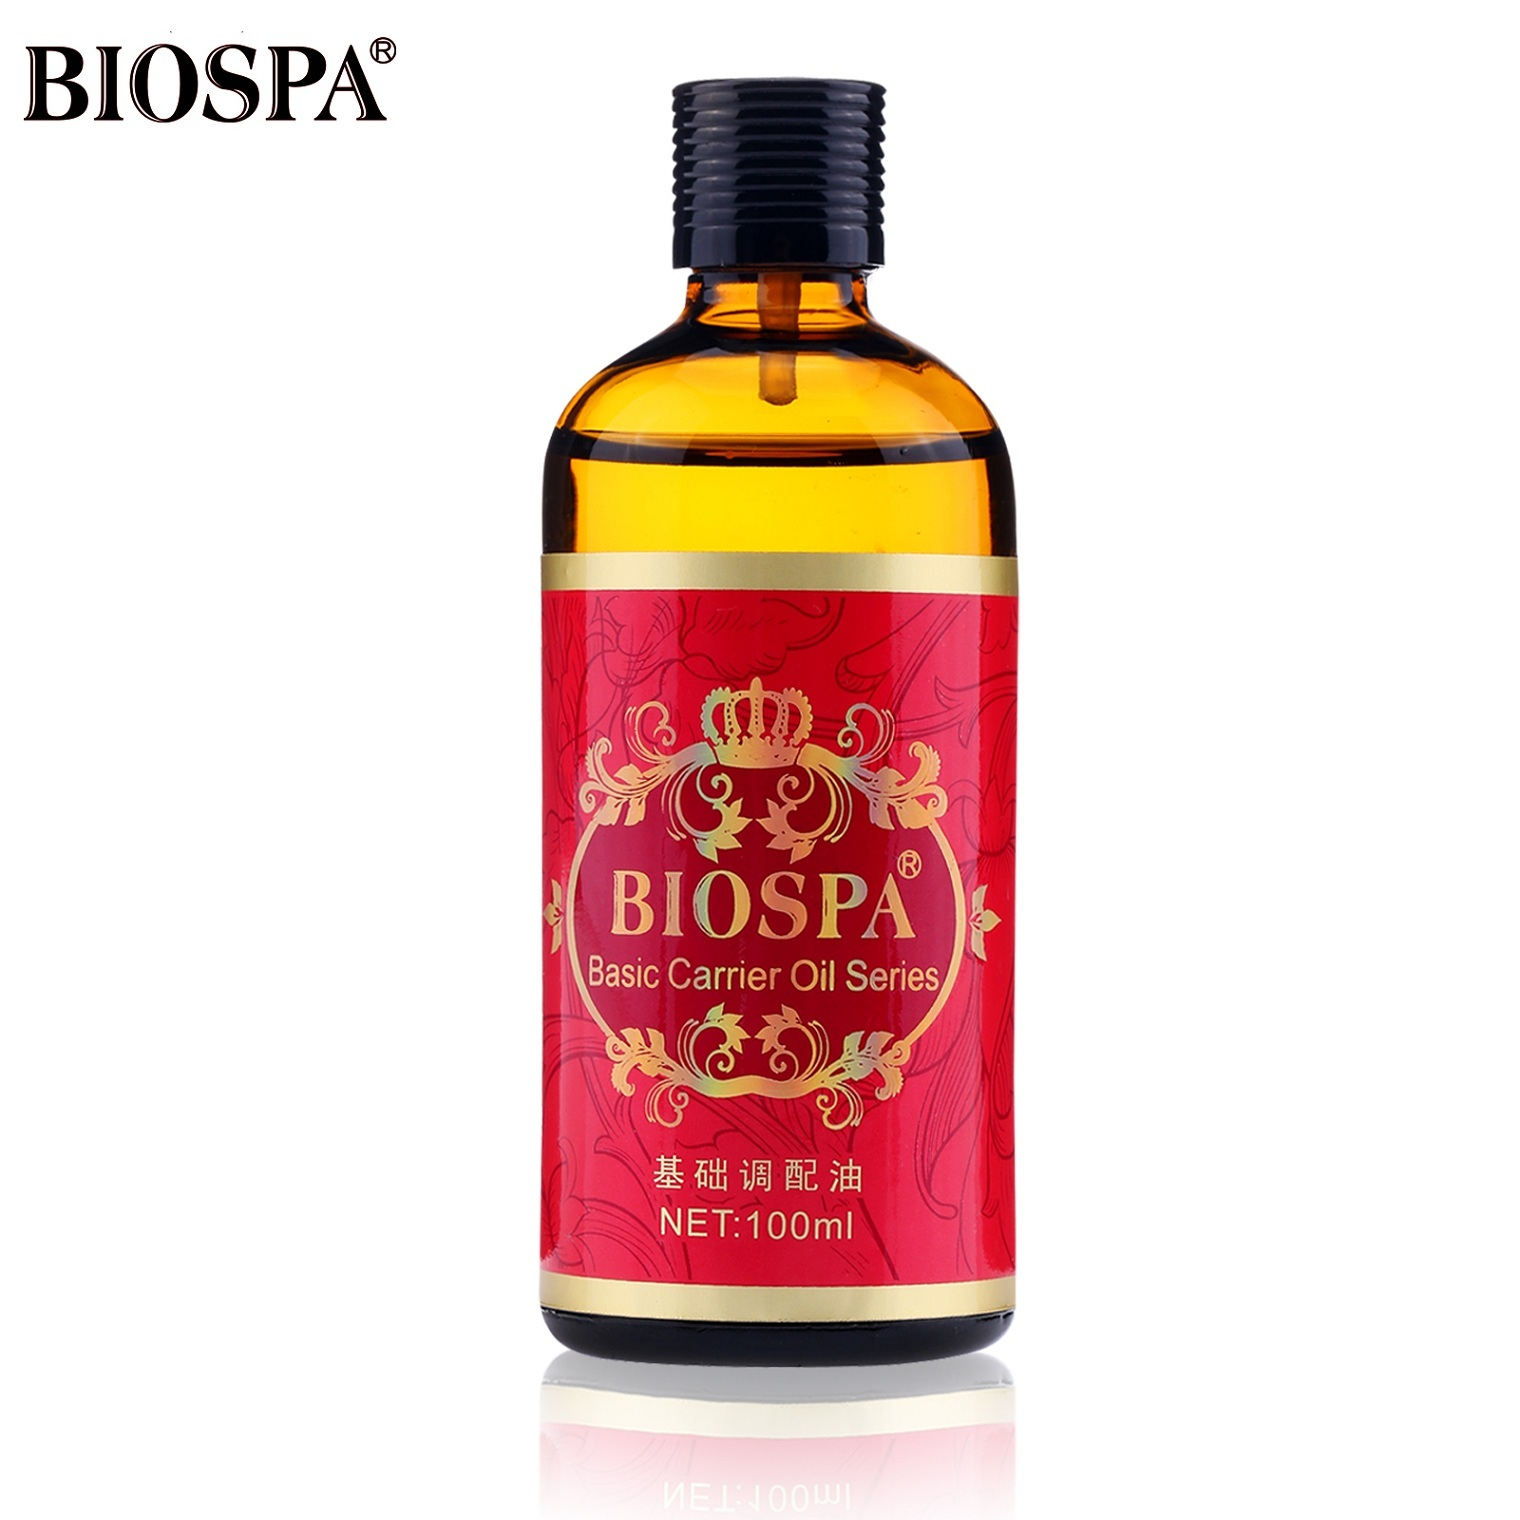 Biospa 荷荷巴油怎么样,好用吗